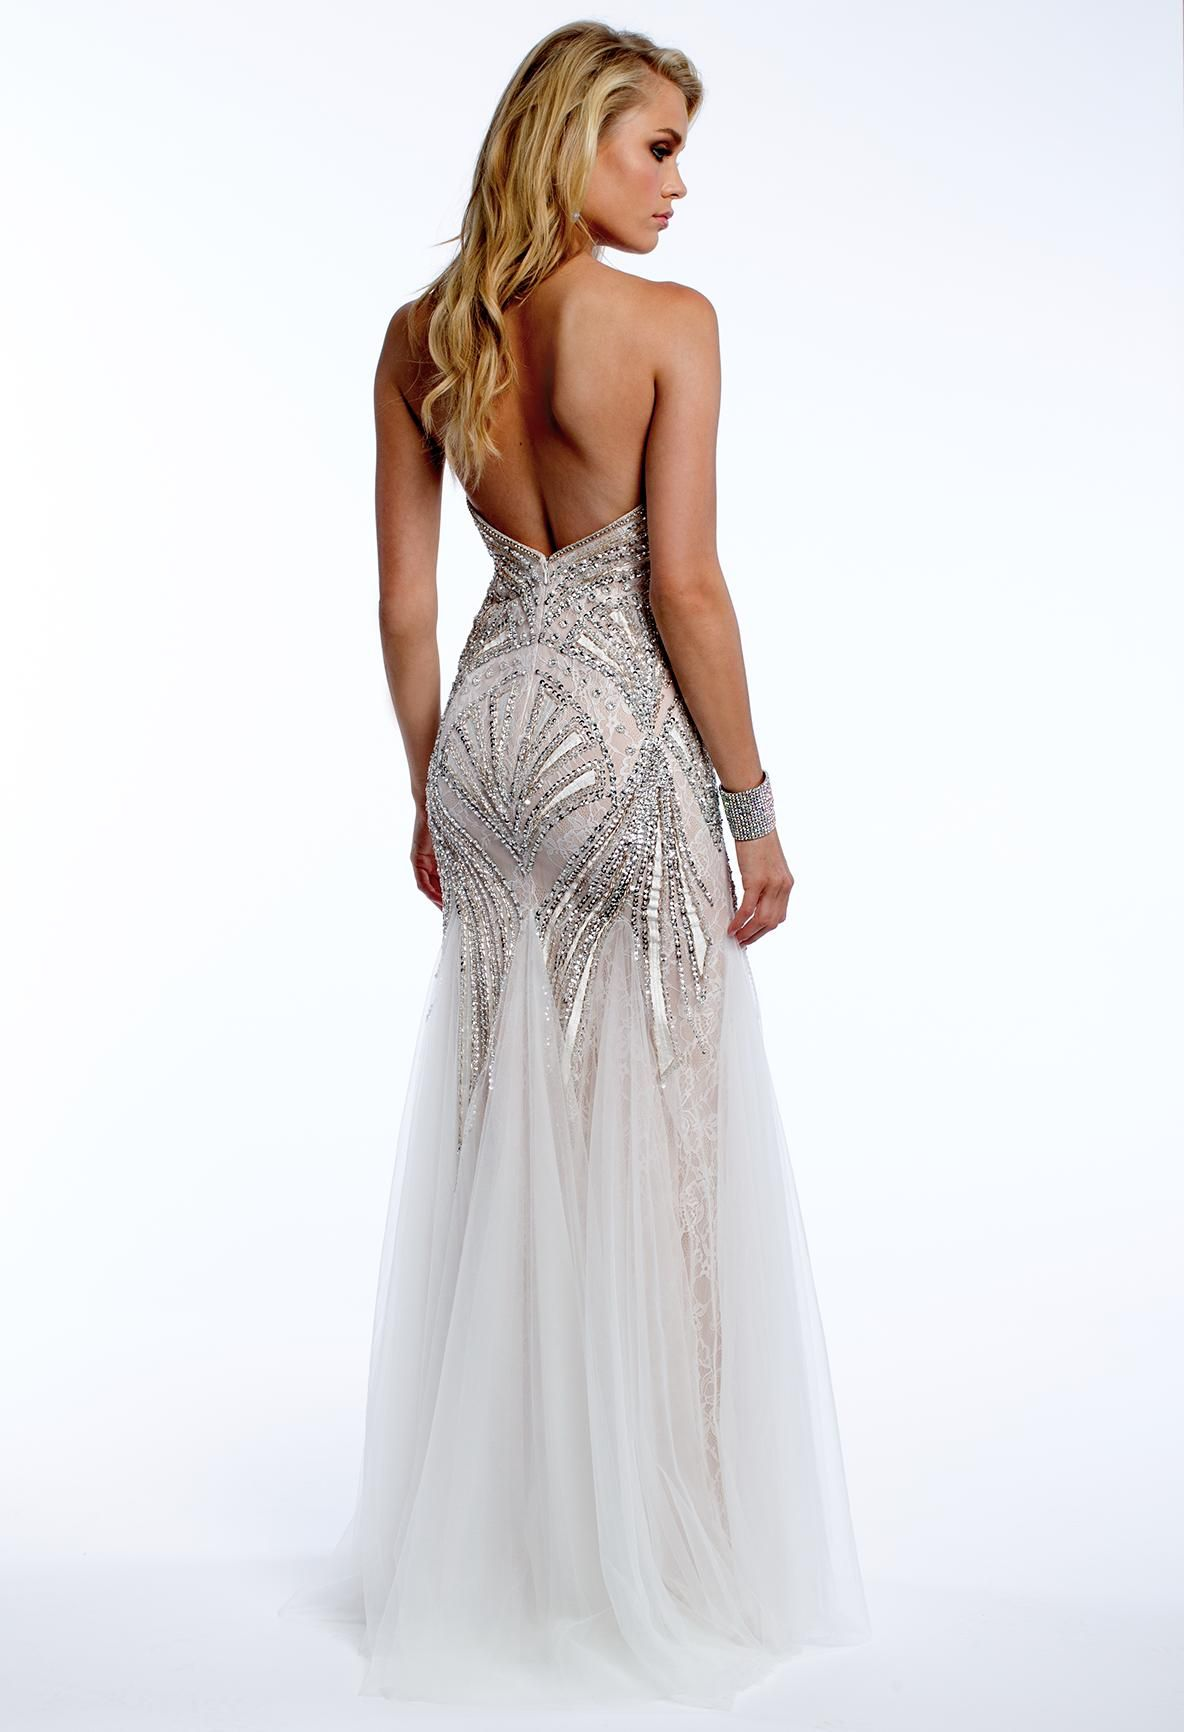 Beaded Deco Prom Dress #camillelavie #CLVprom | PROM DRESSES | Pinterest